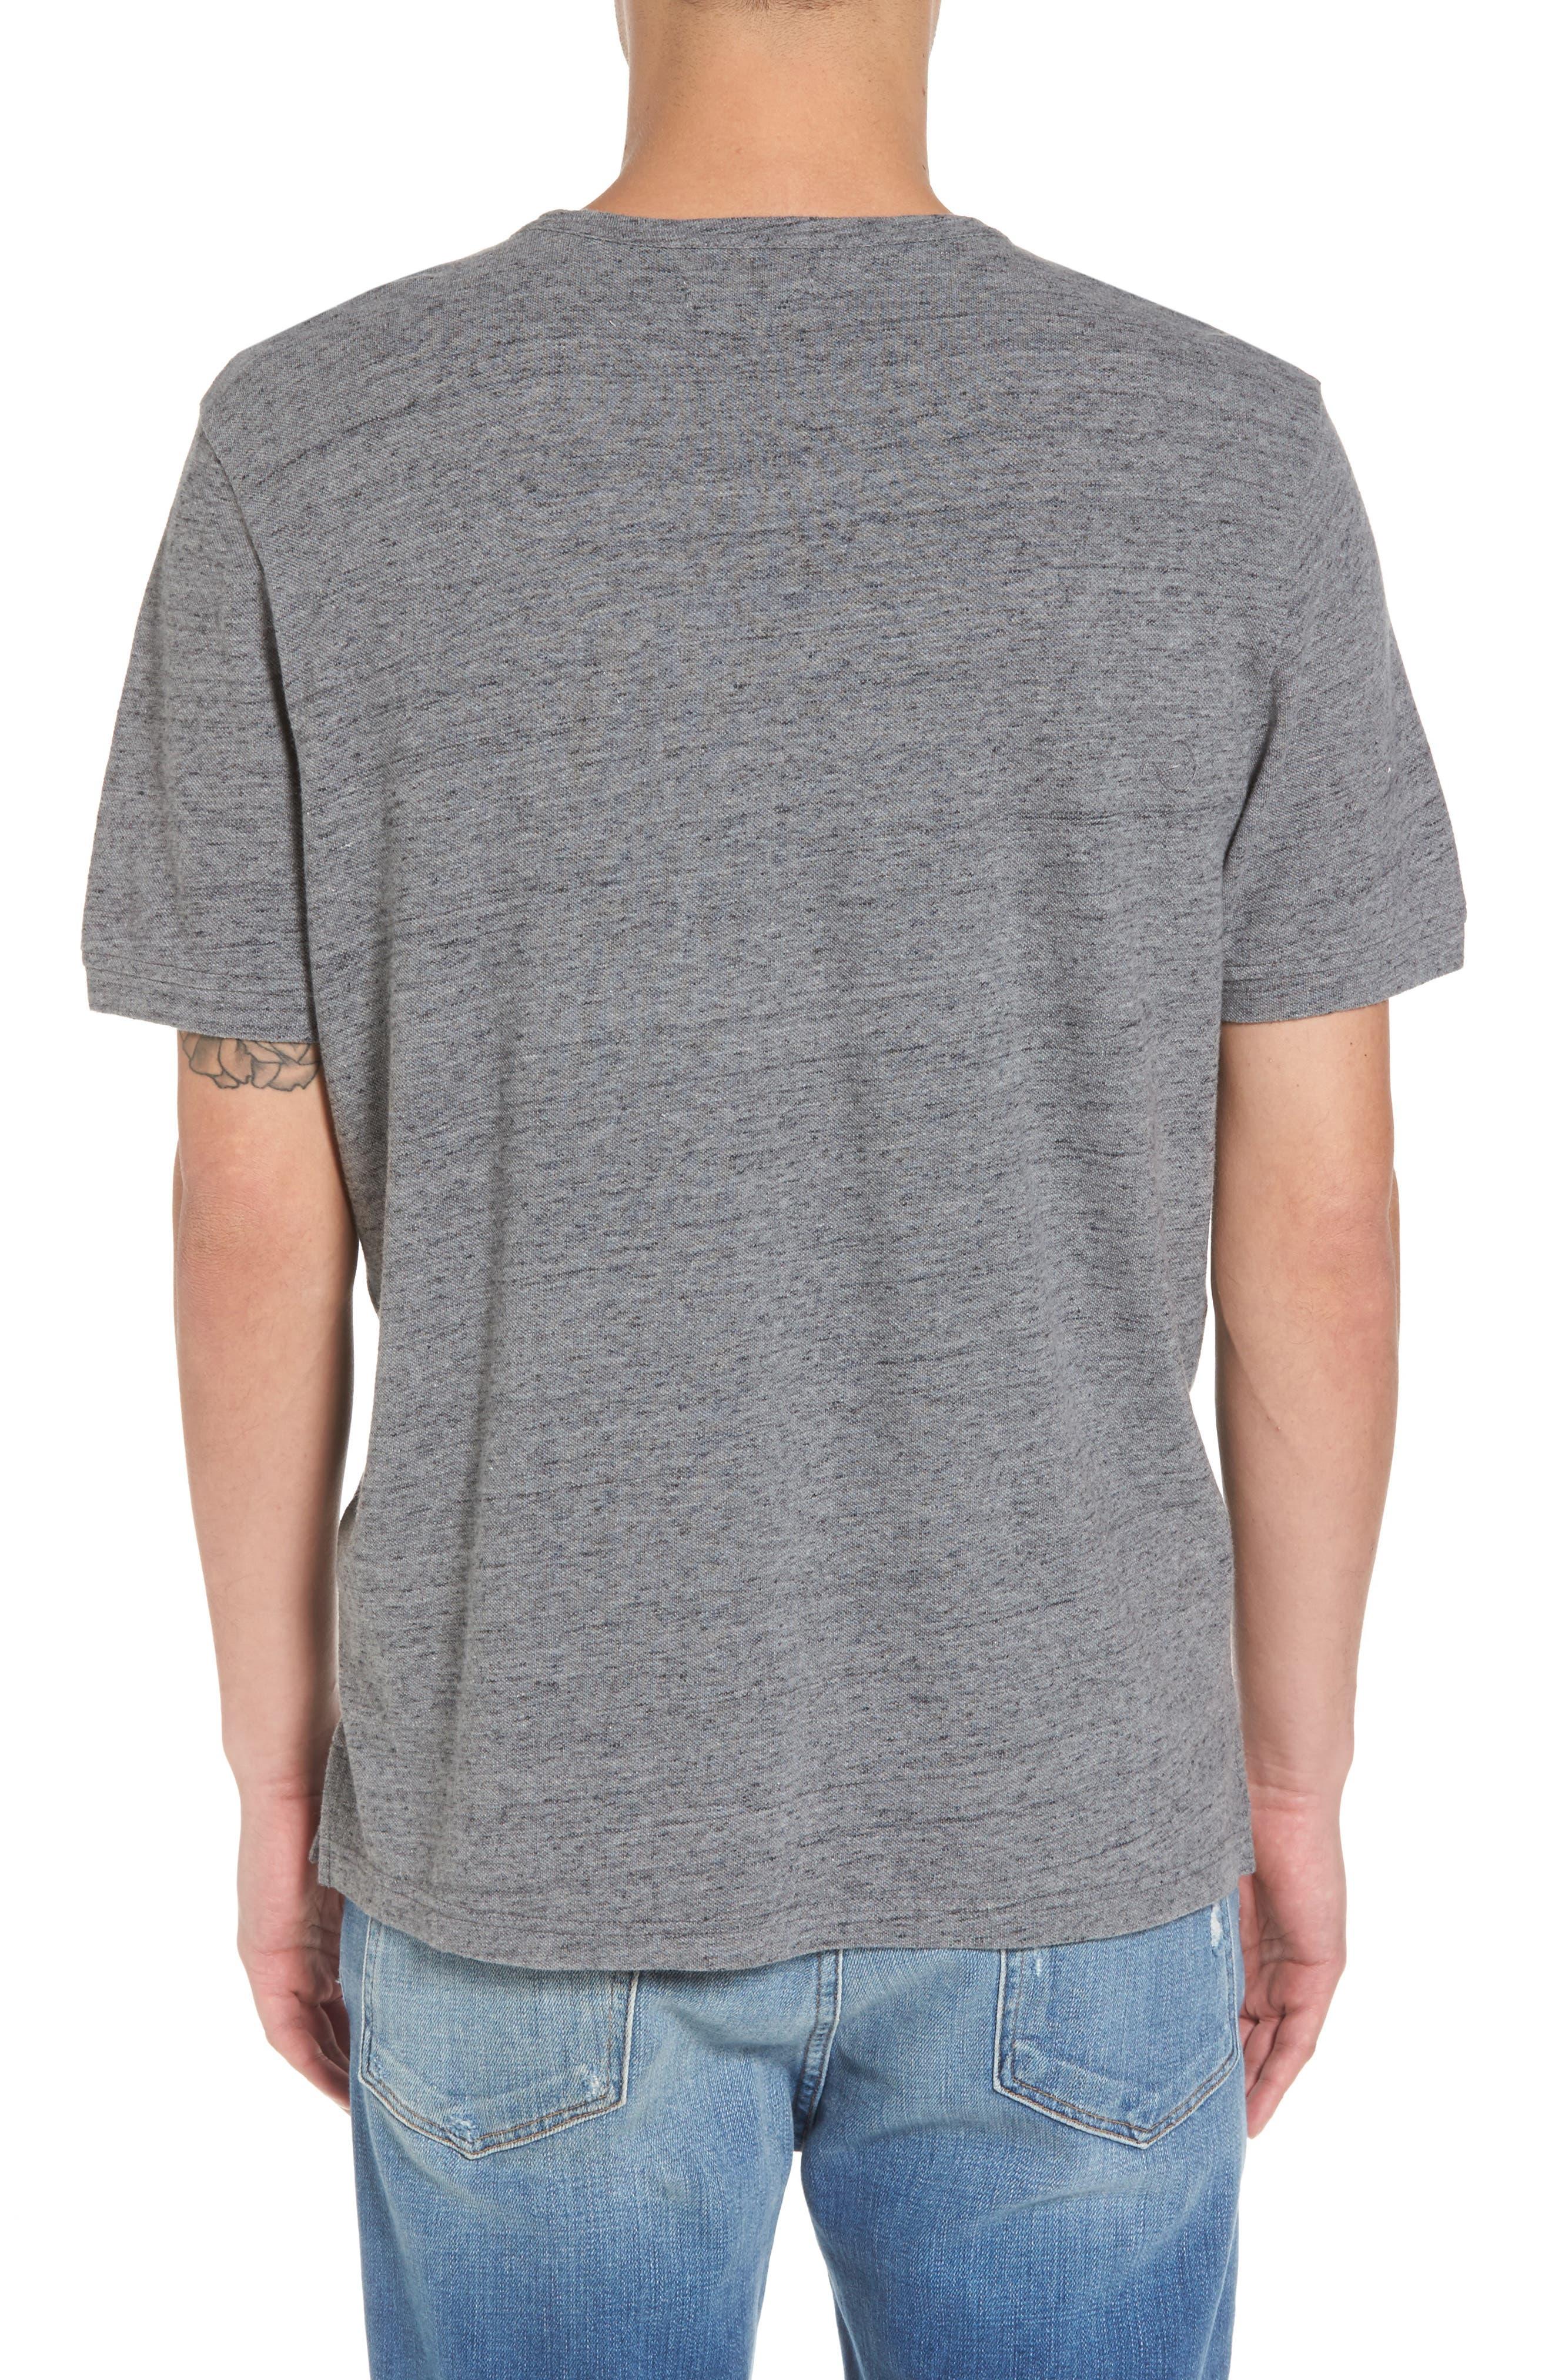 THE RAIL,                             Piqué T-Shirt,                             Alternate thumbnail 2, color,                             030